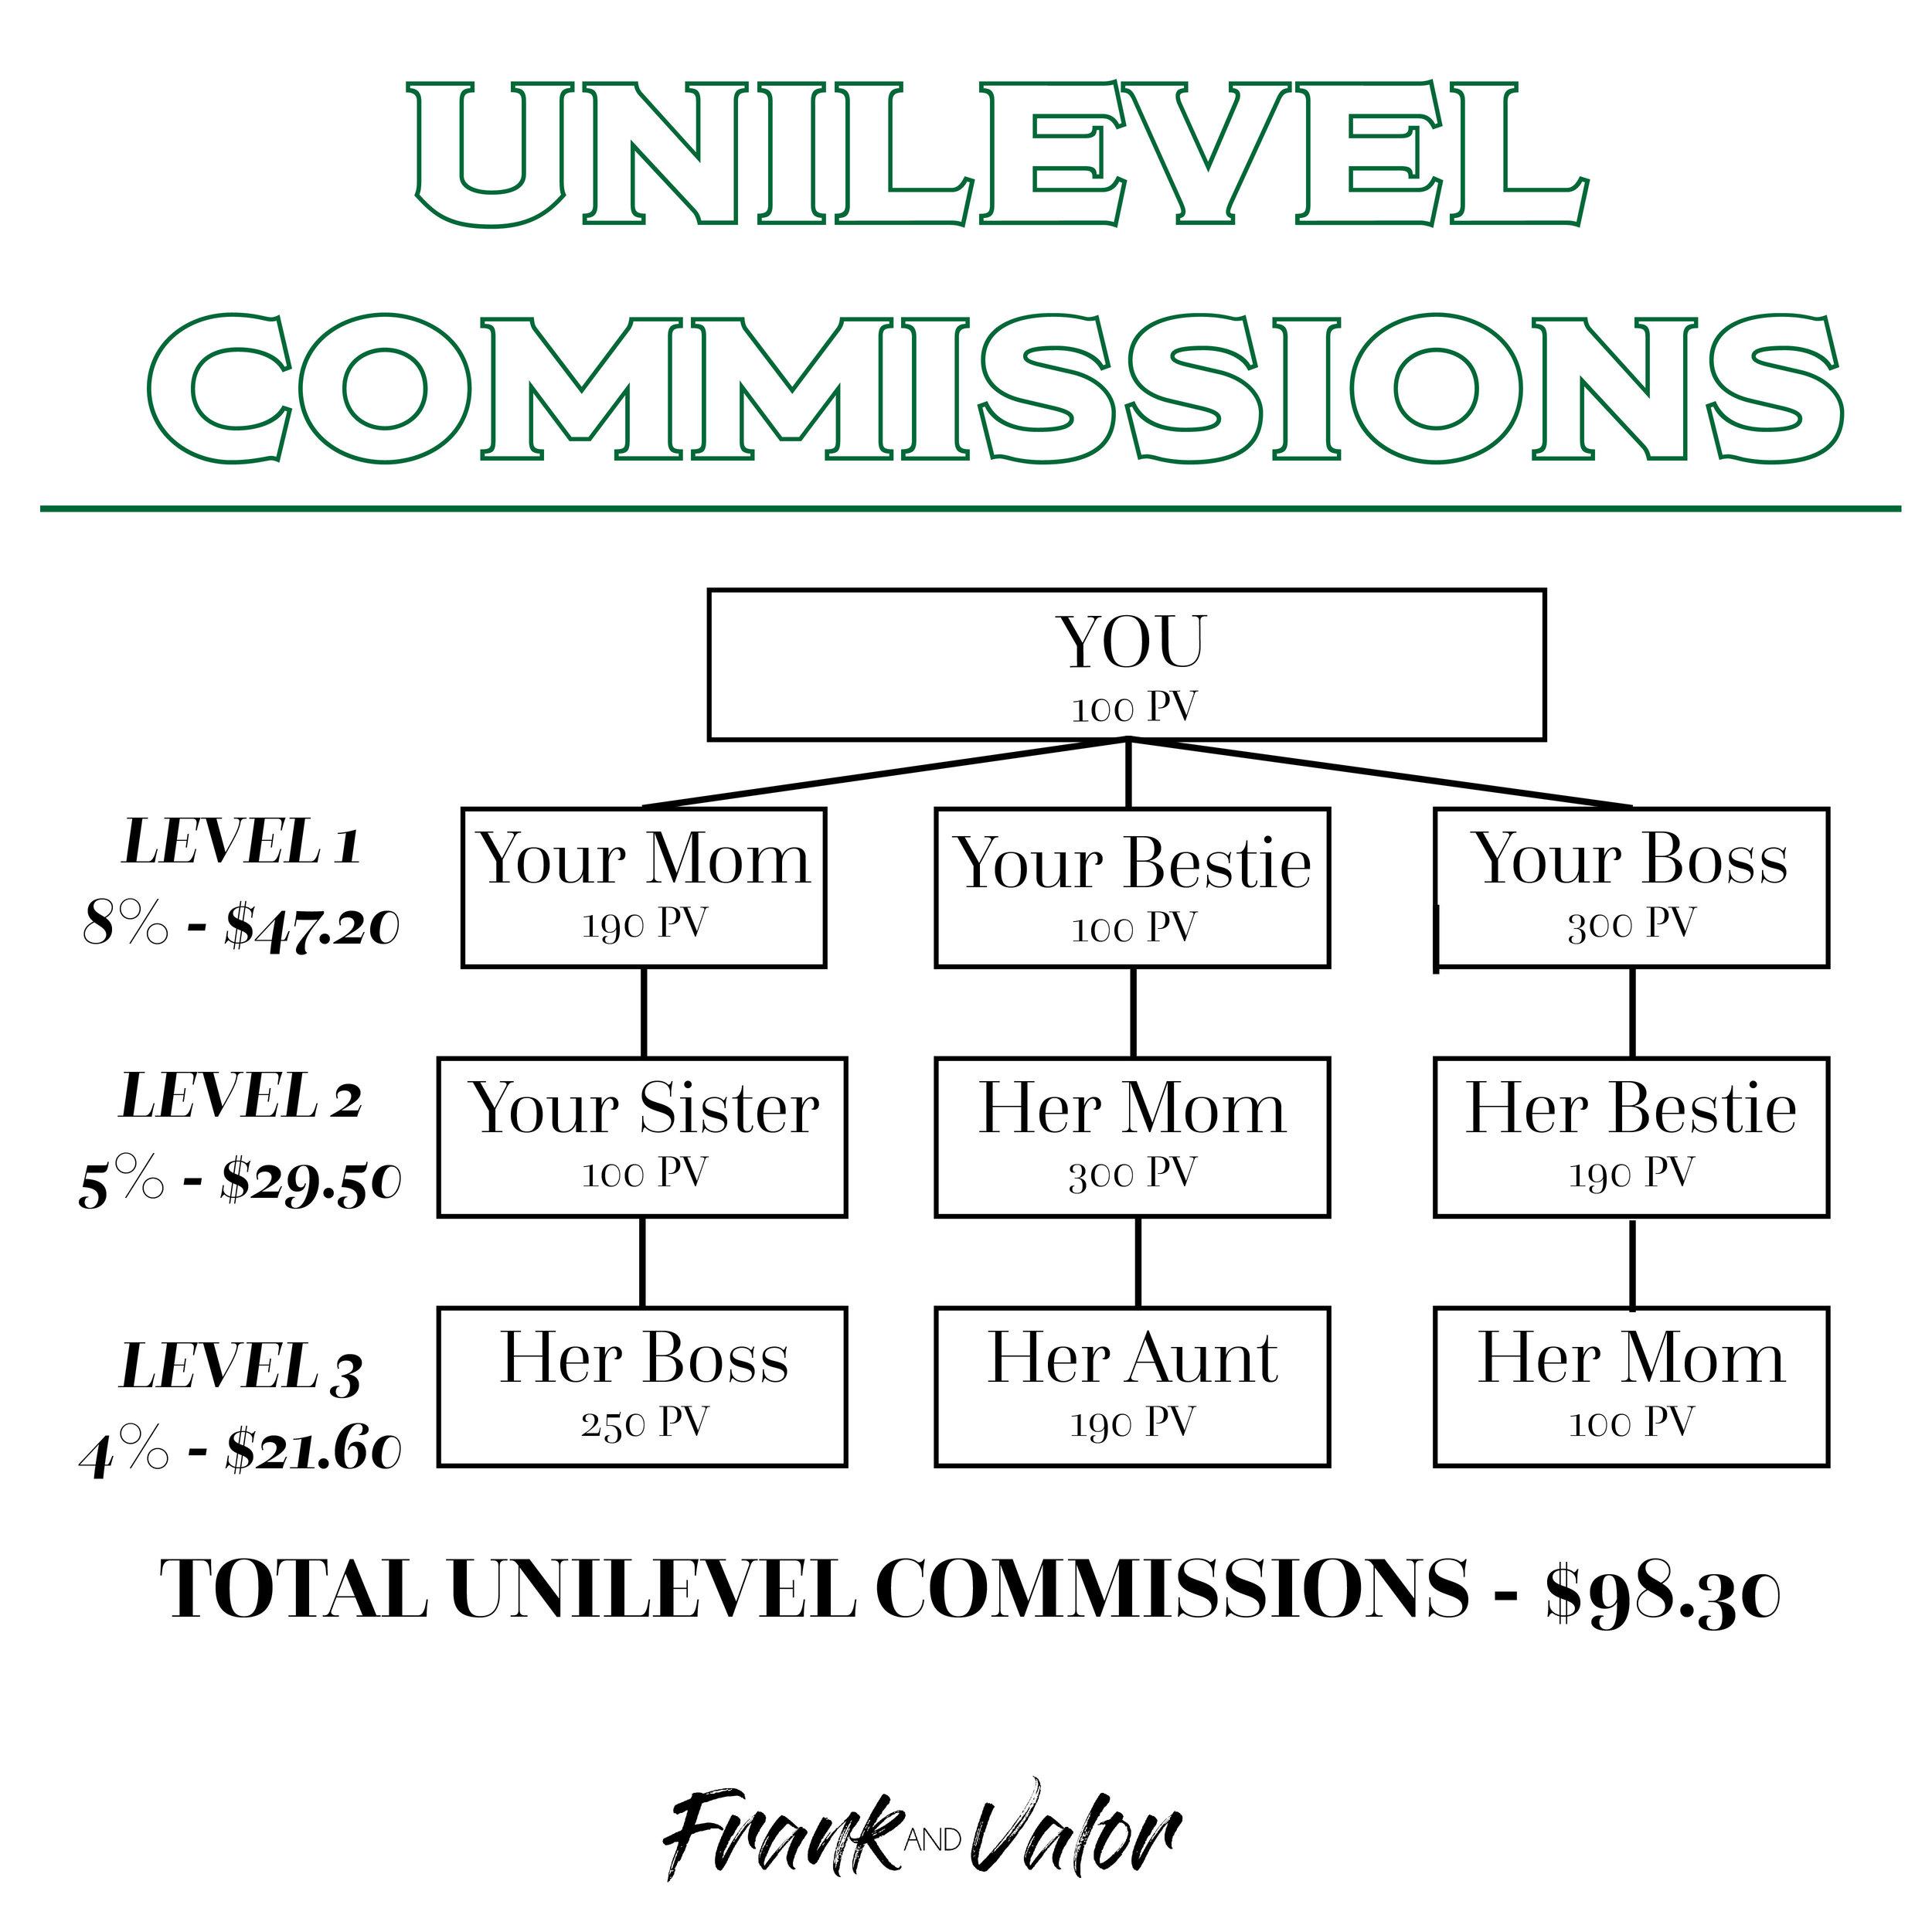 UniLevel Commissions-01.jpg